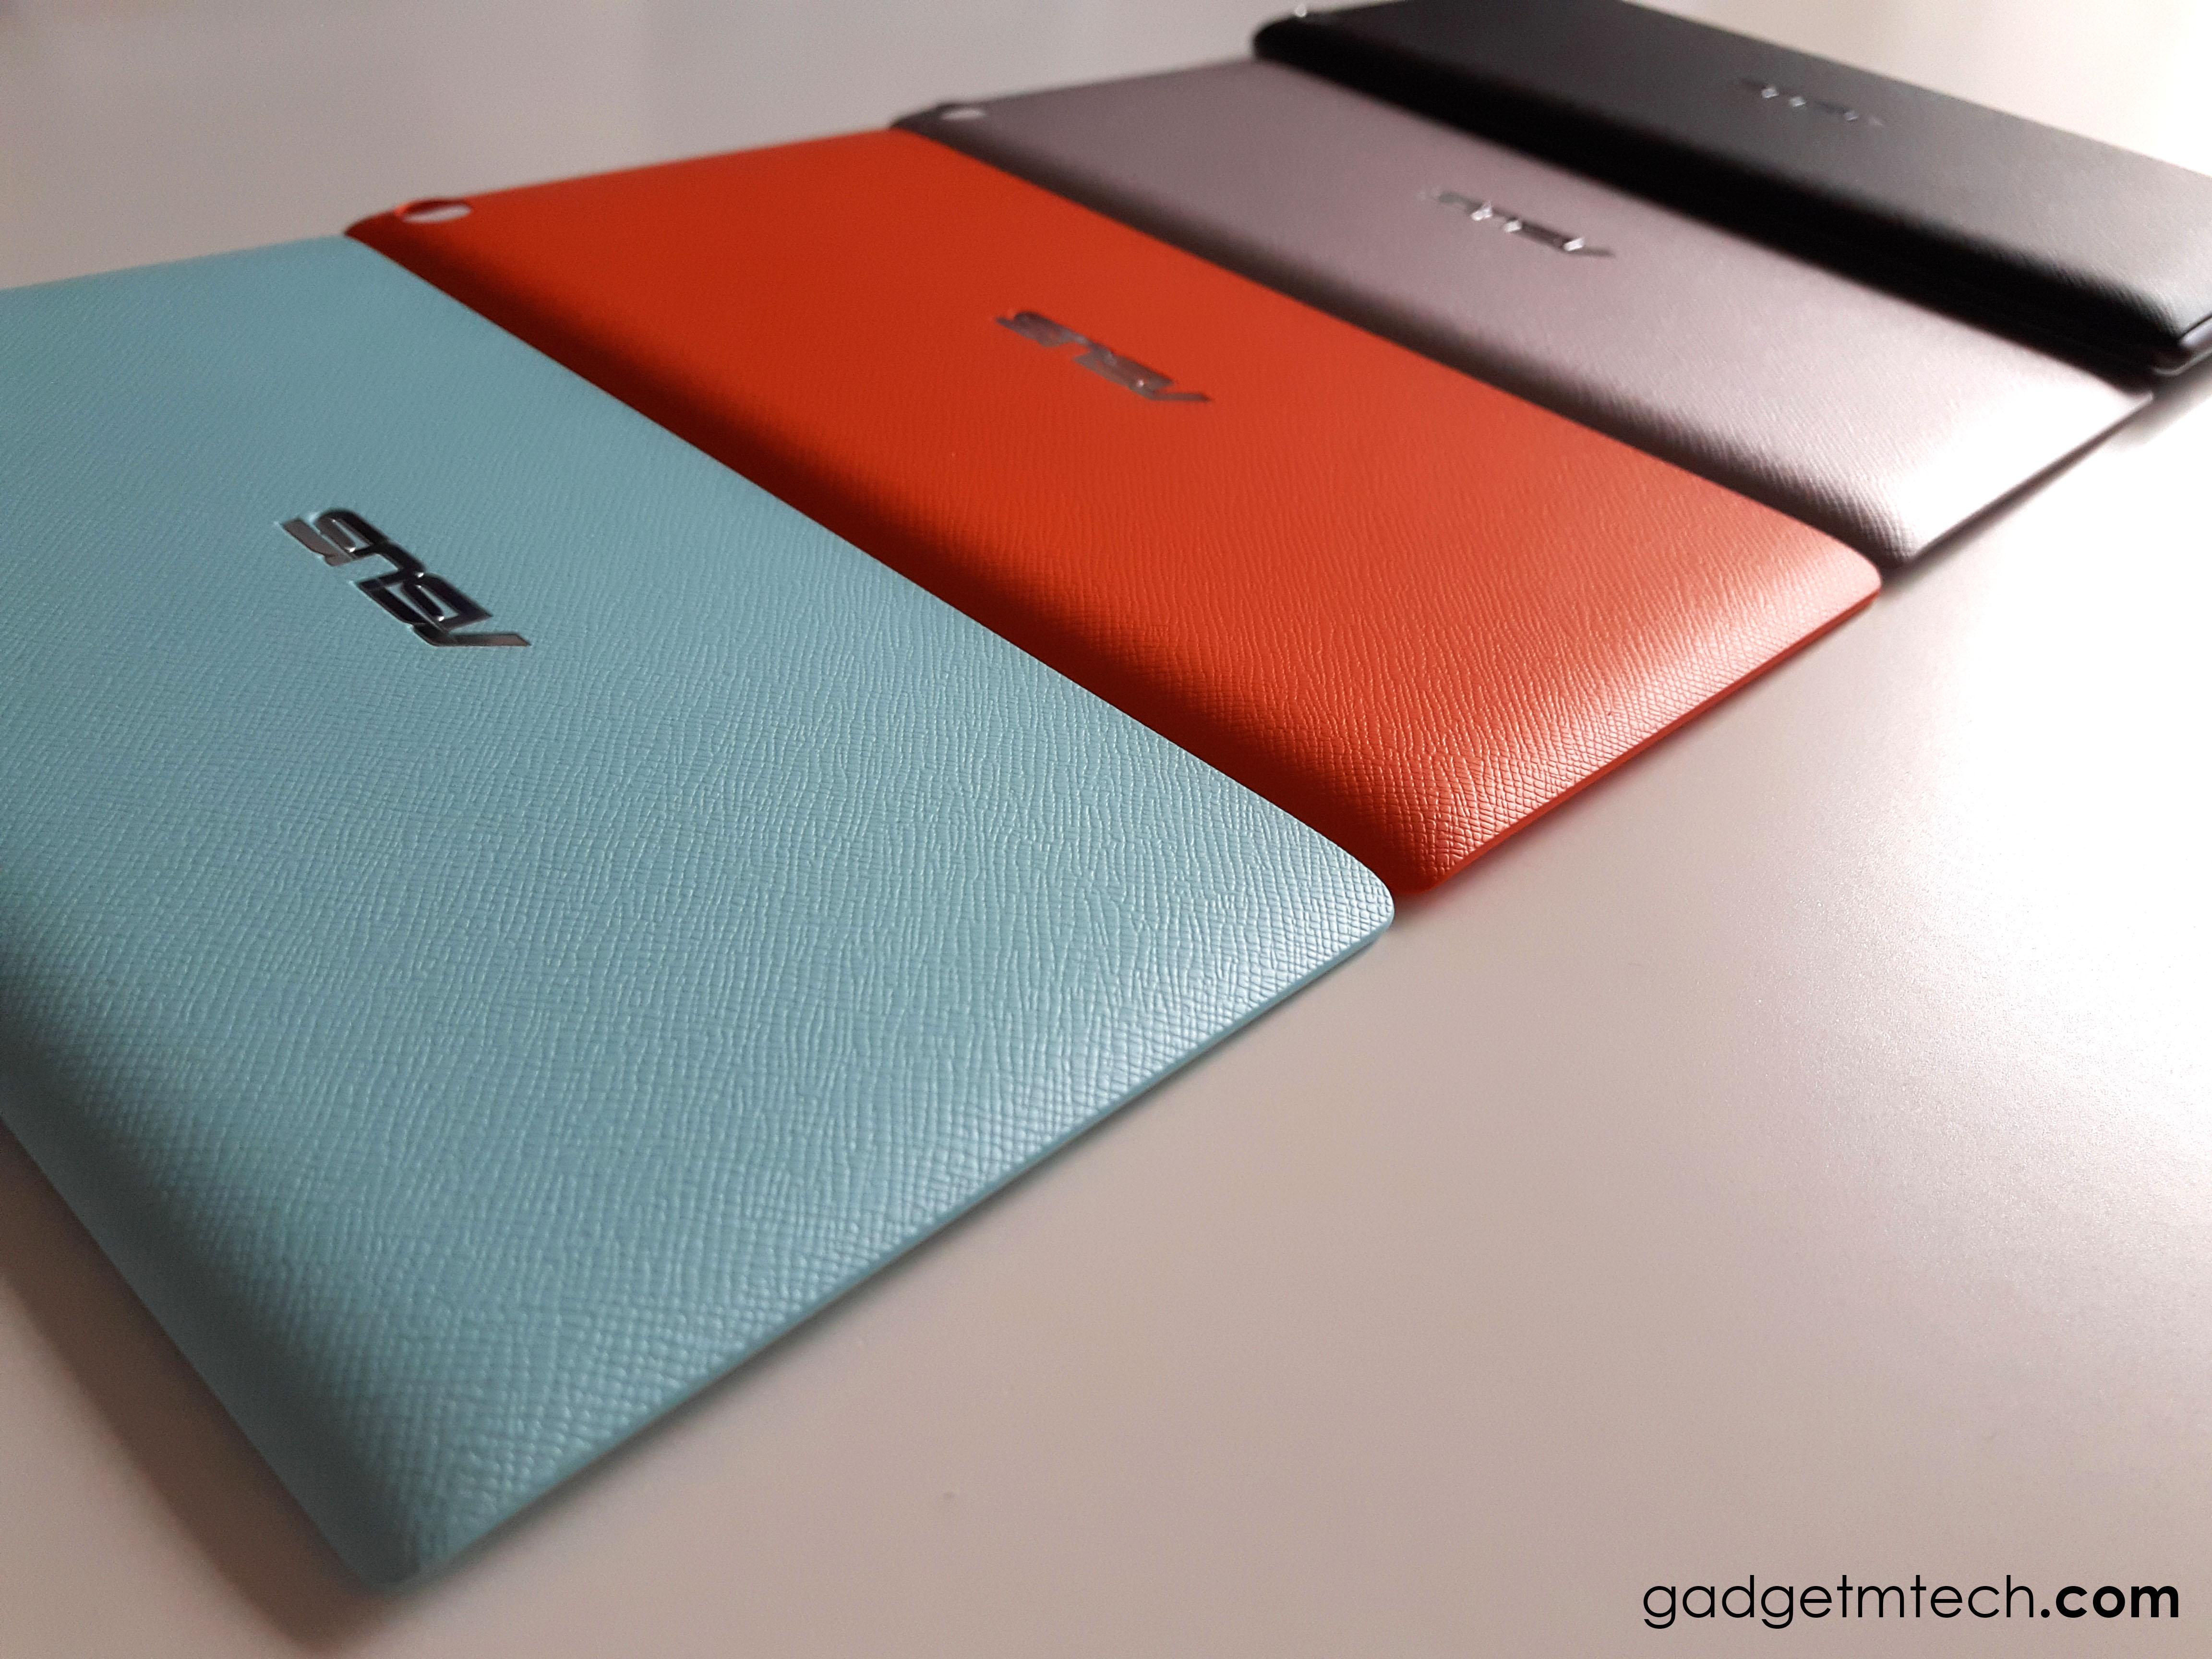 ASUS ZenPad 7.0 (Z370CG) Unboxing_9